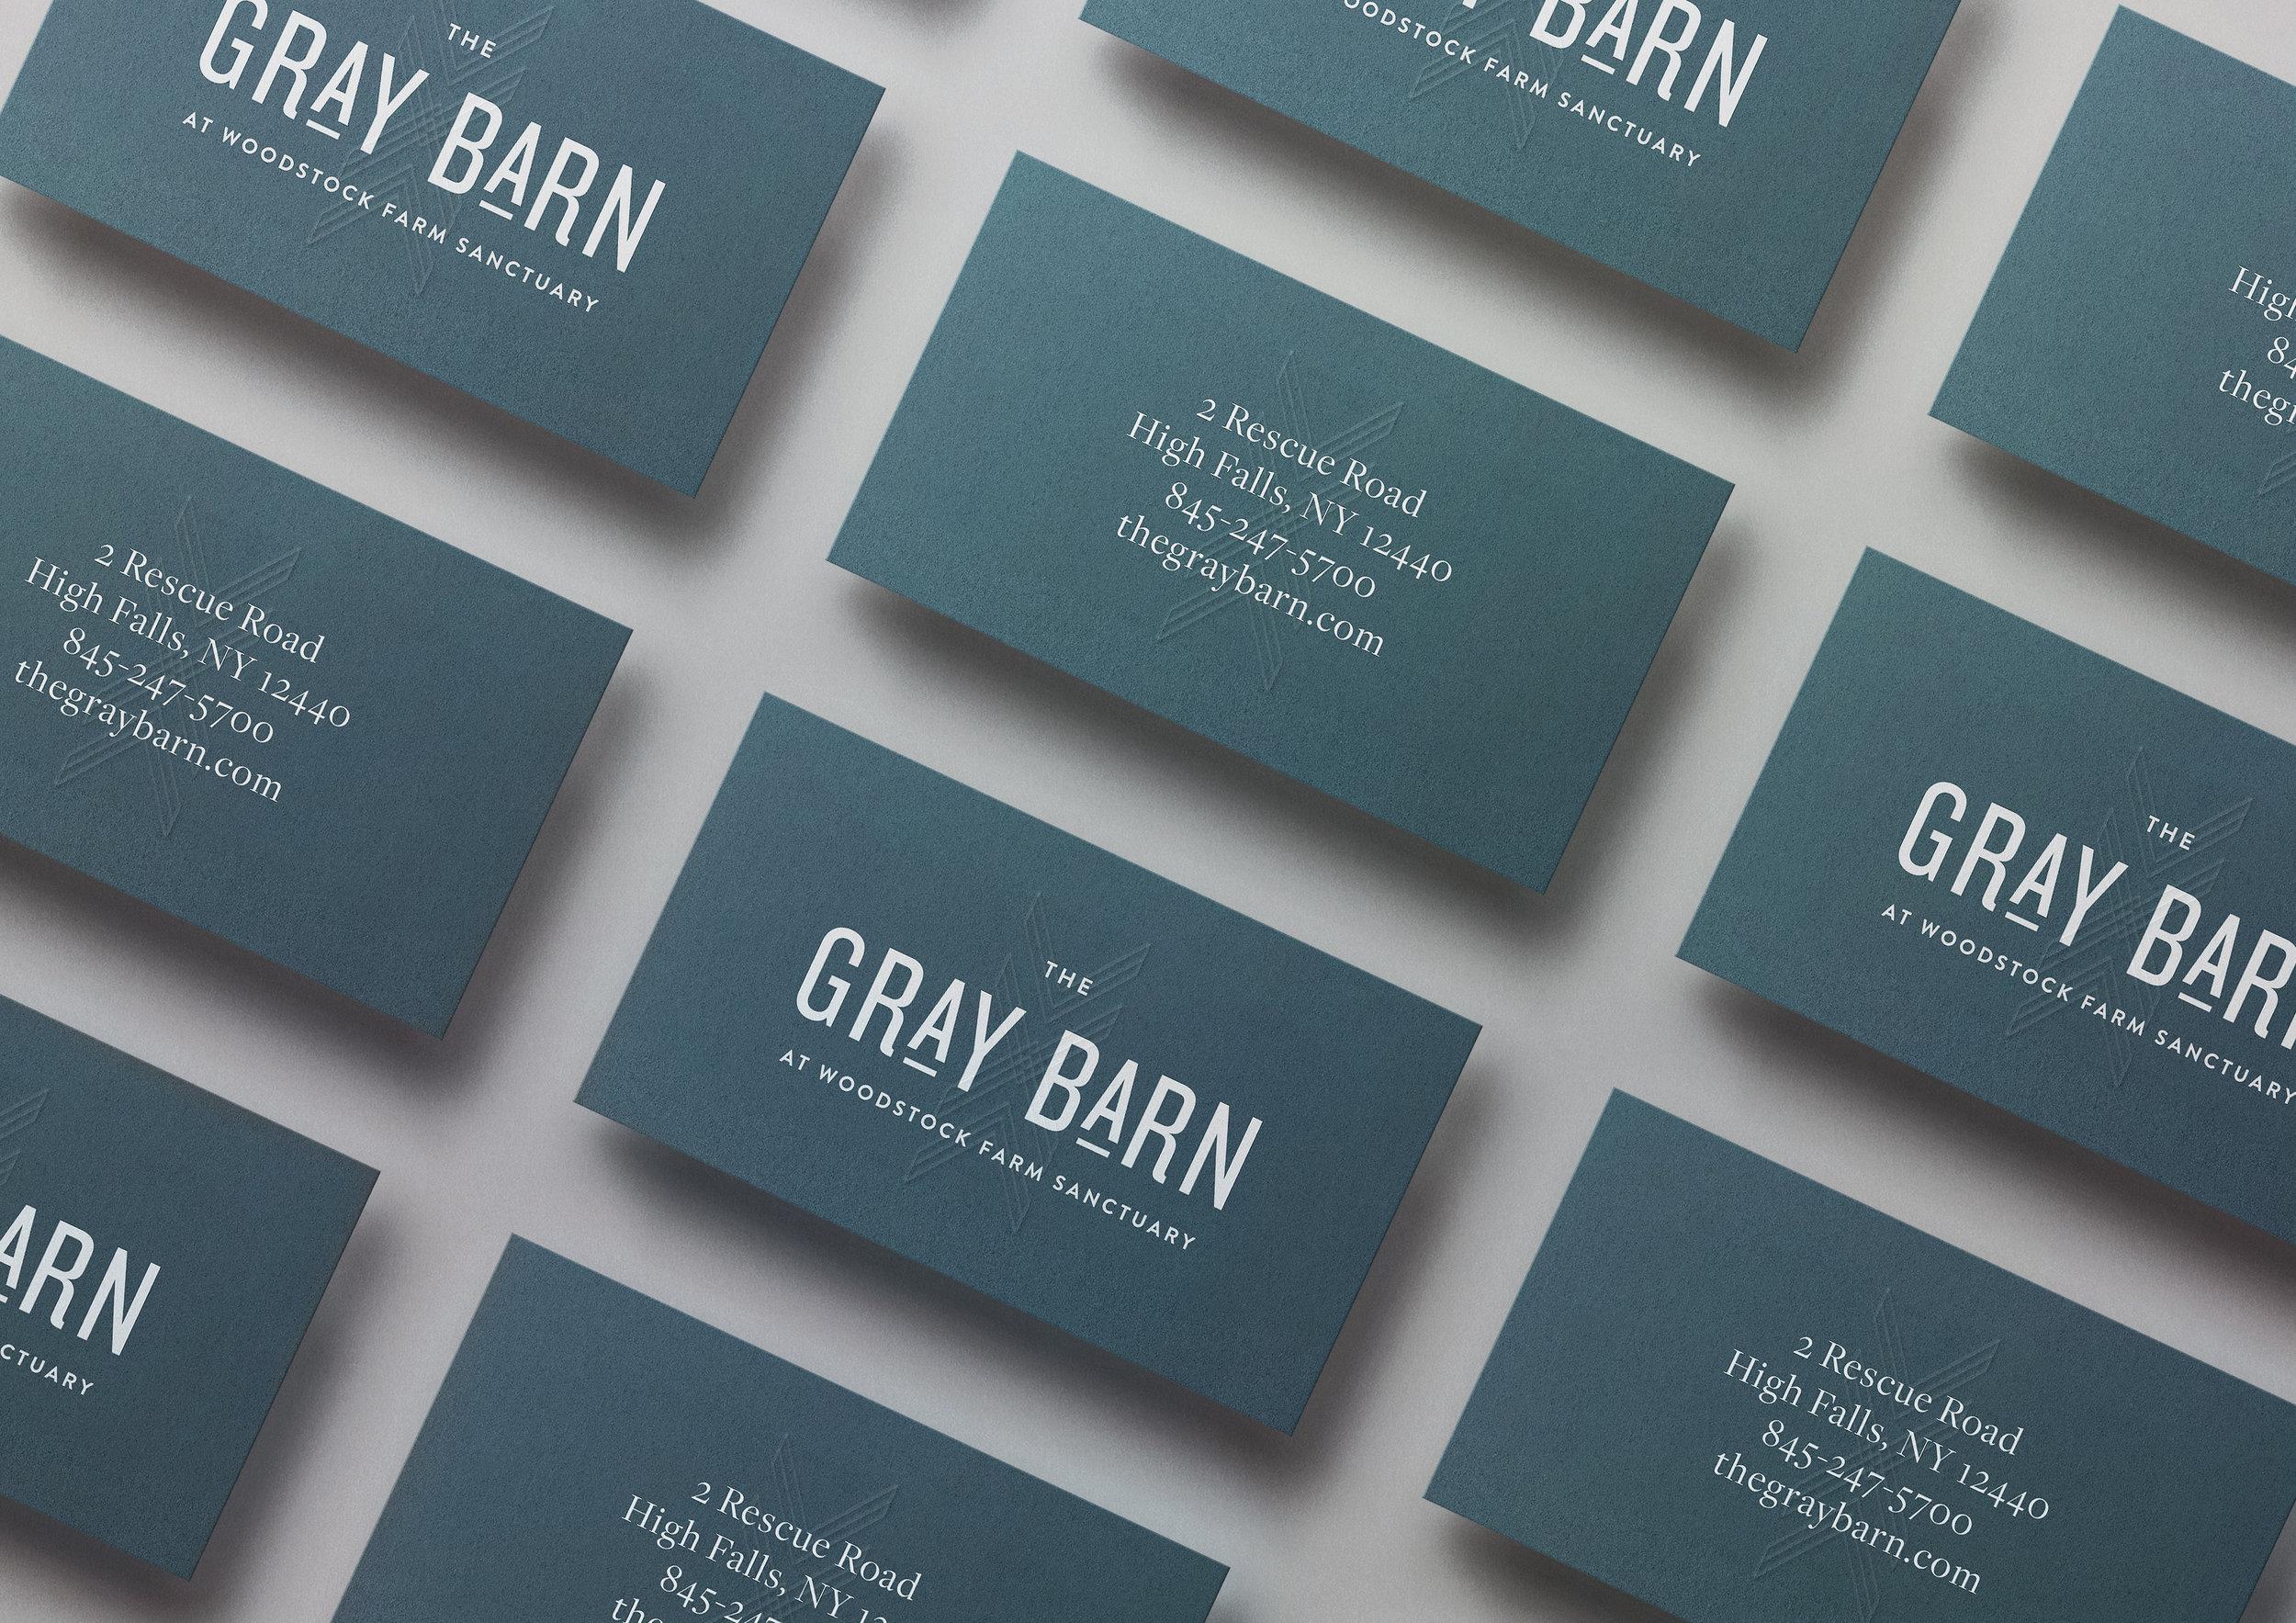 Gray-Barn_Business-Card-Design.jpg